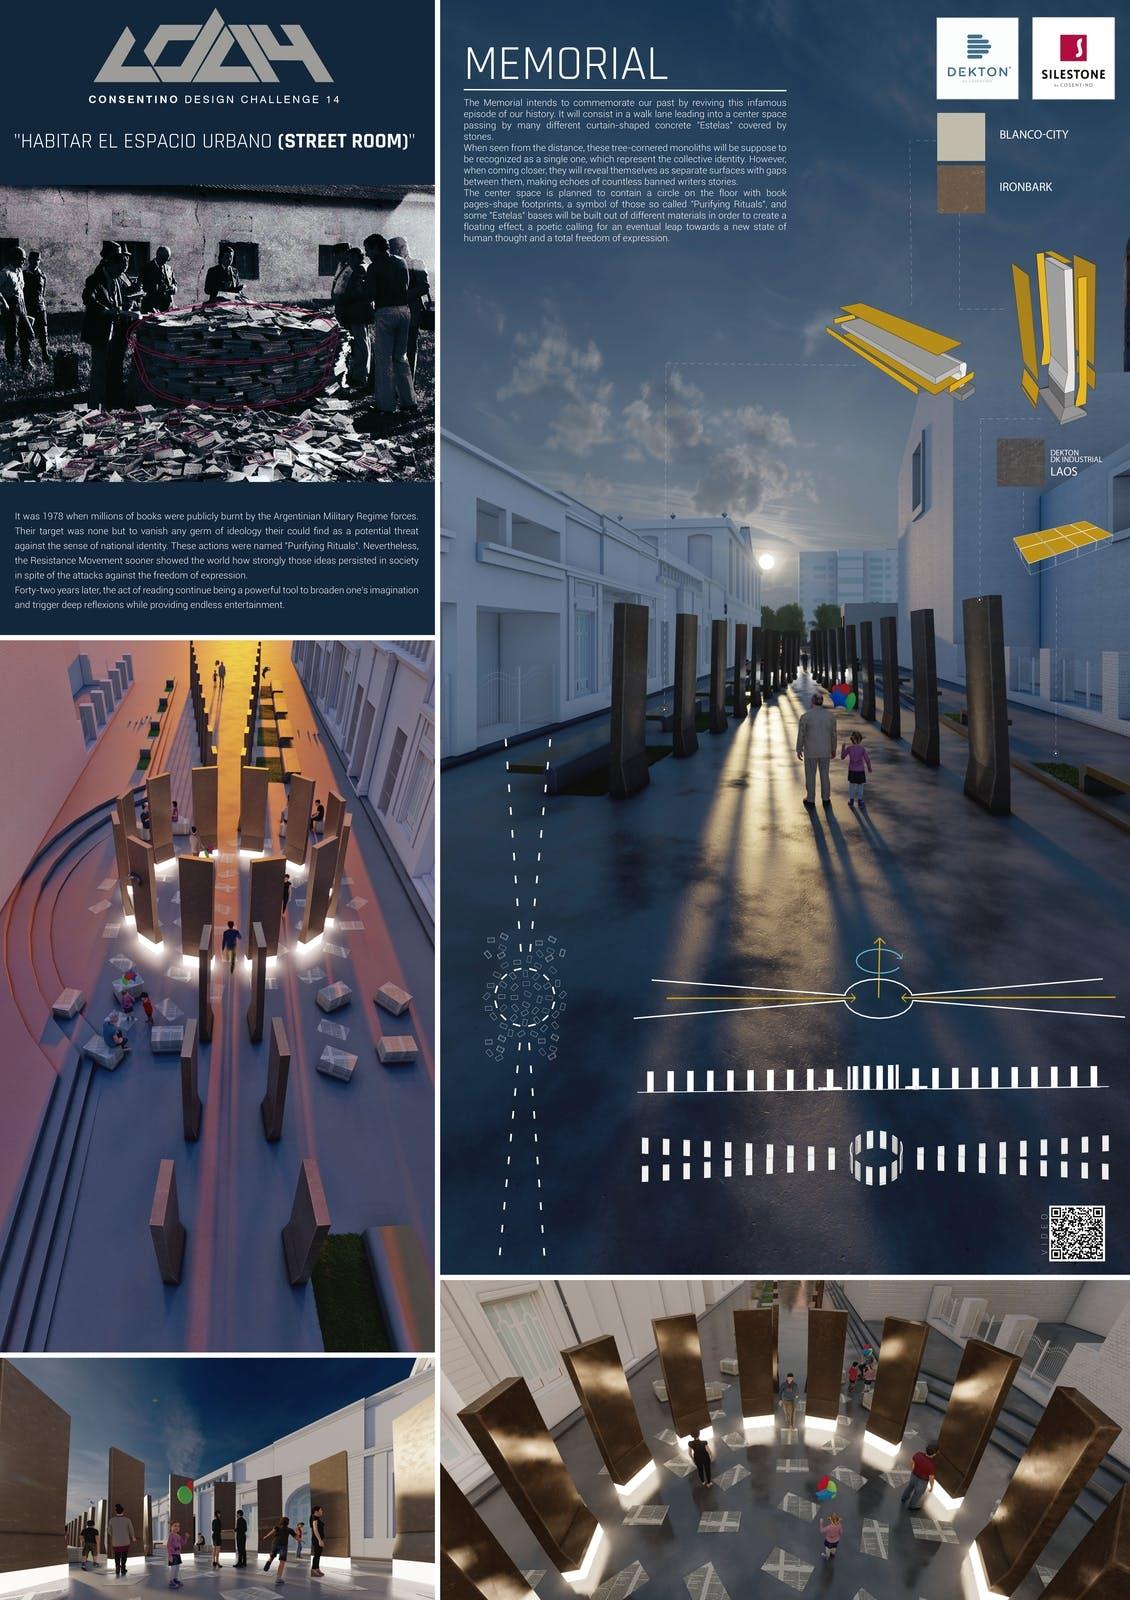 Image of 074 MEMORIAL s in Cosentino Design Challenge 14 winners - Cosentino